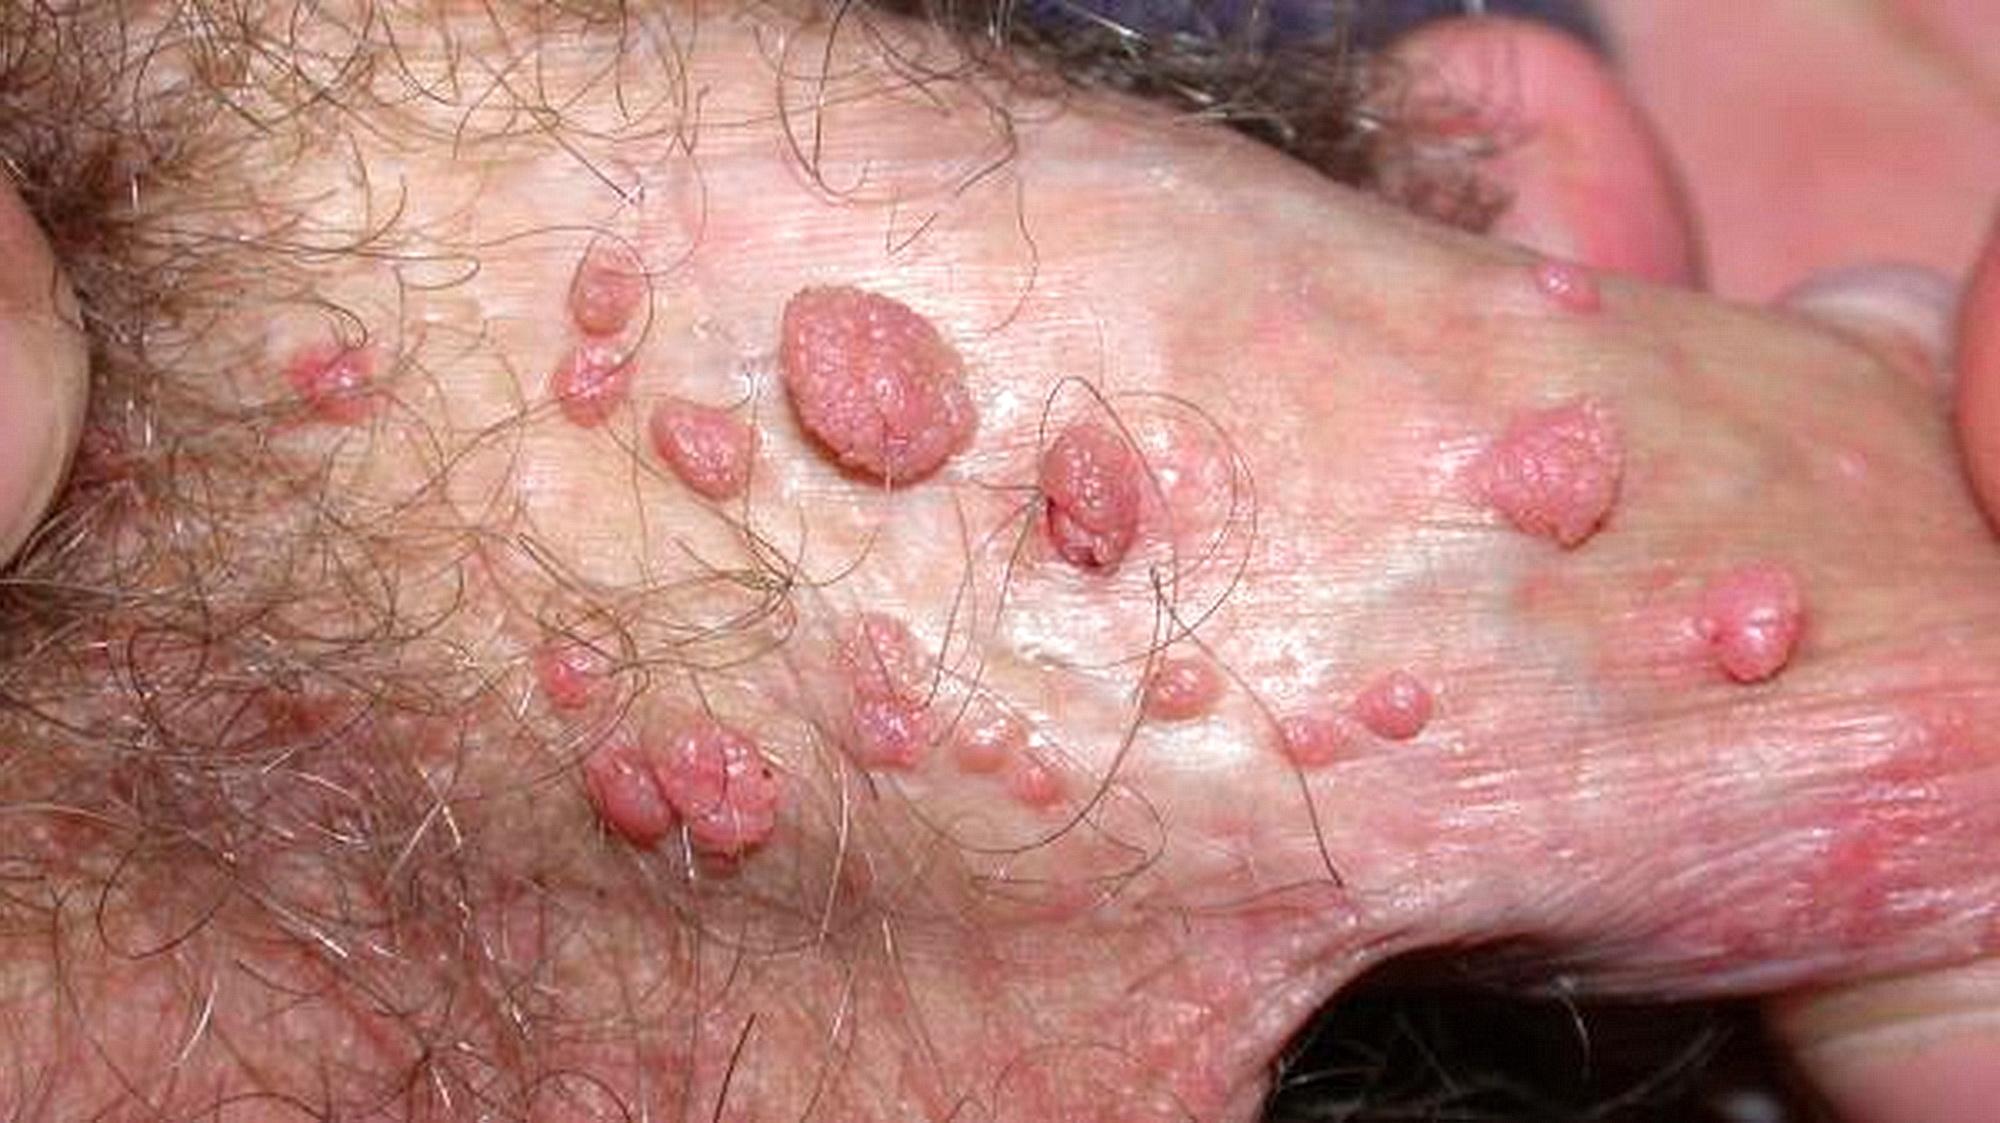 veruca genitala Papilloma virus donne verruche